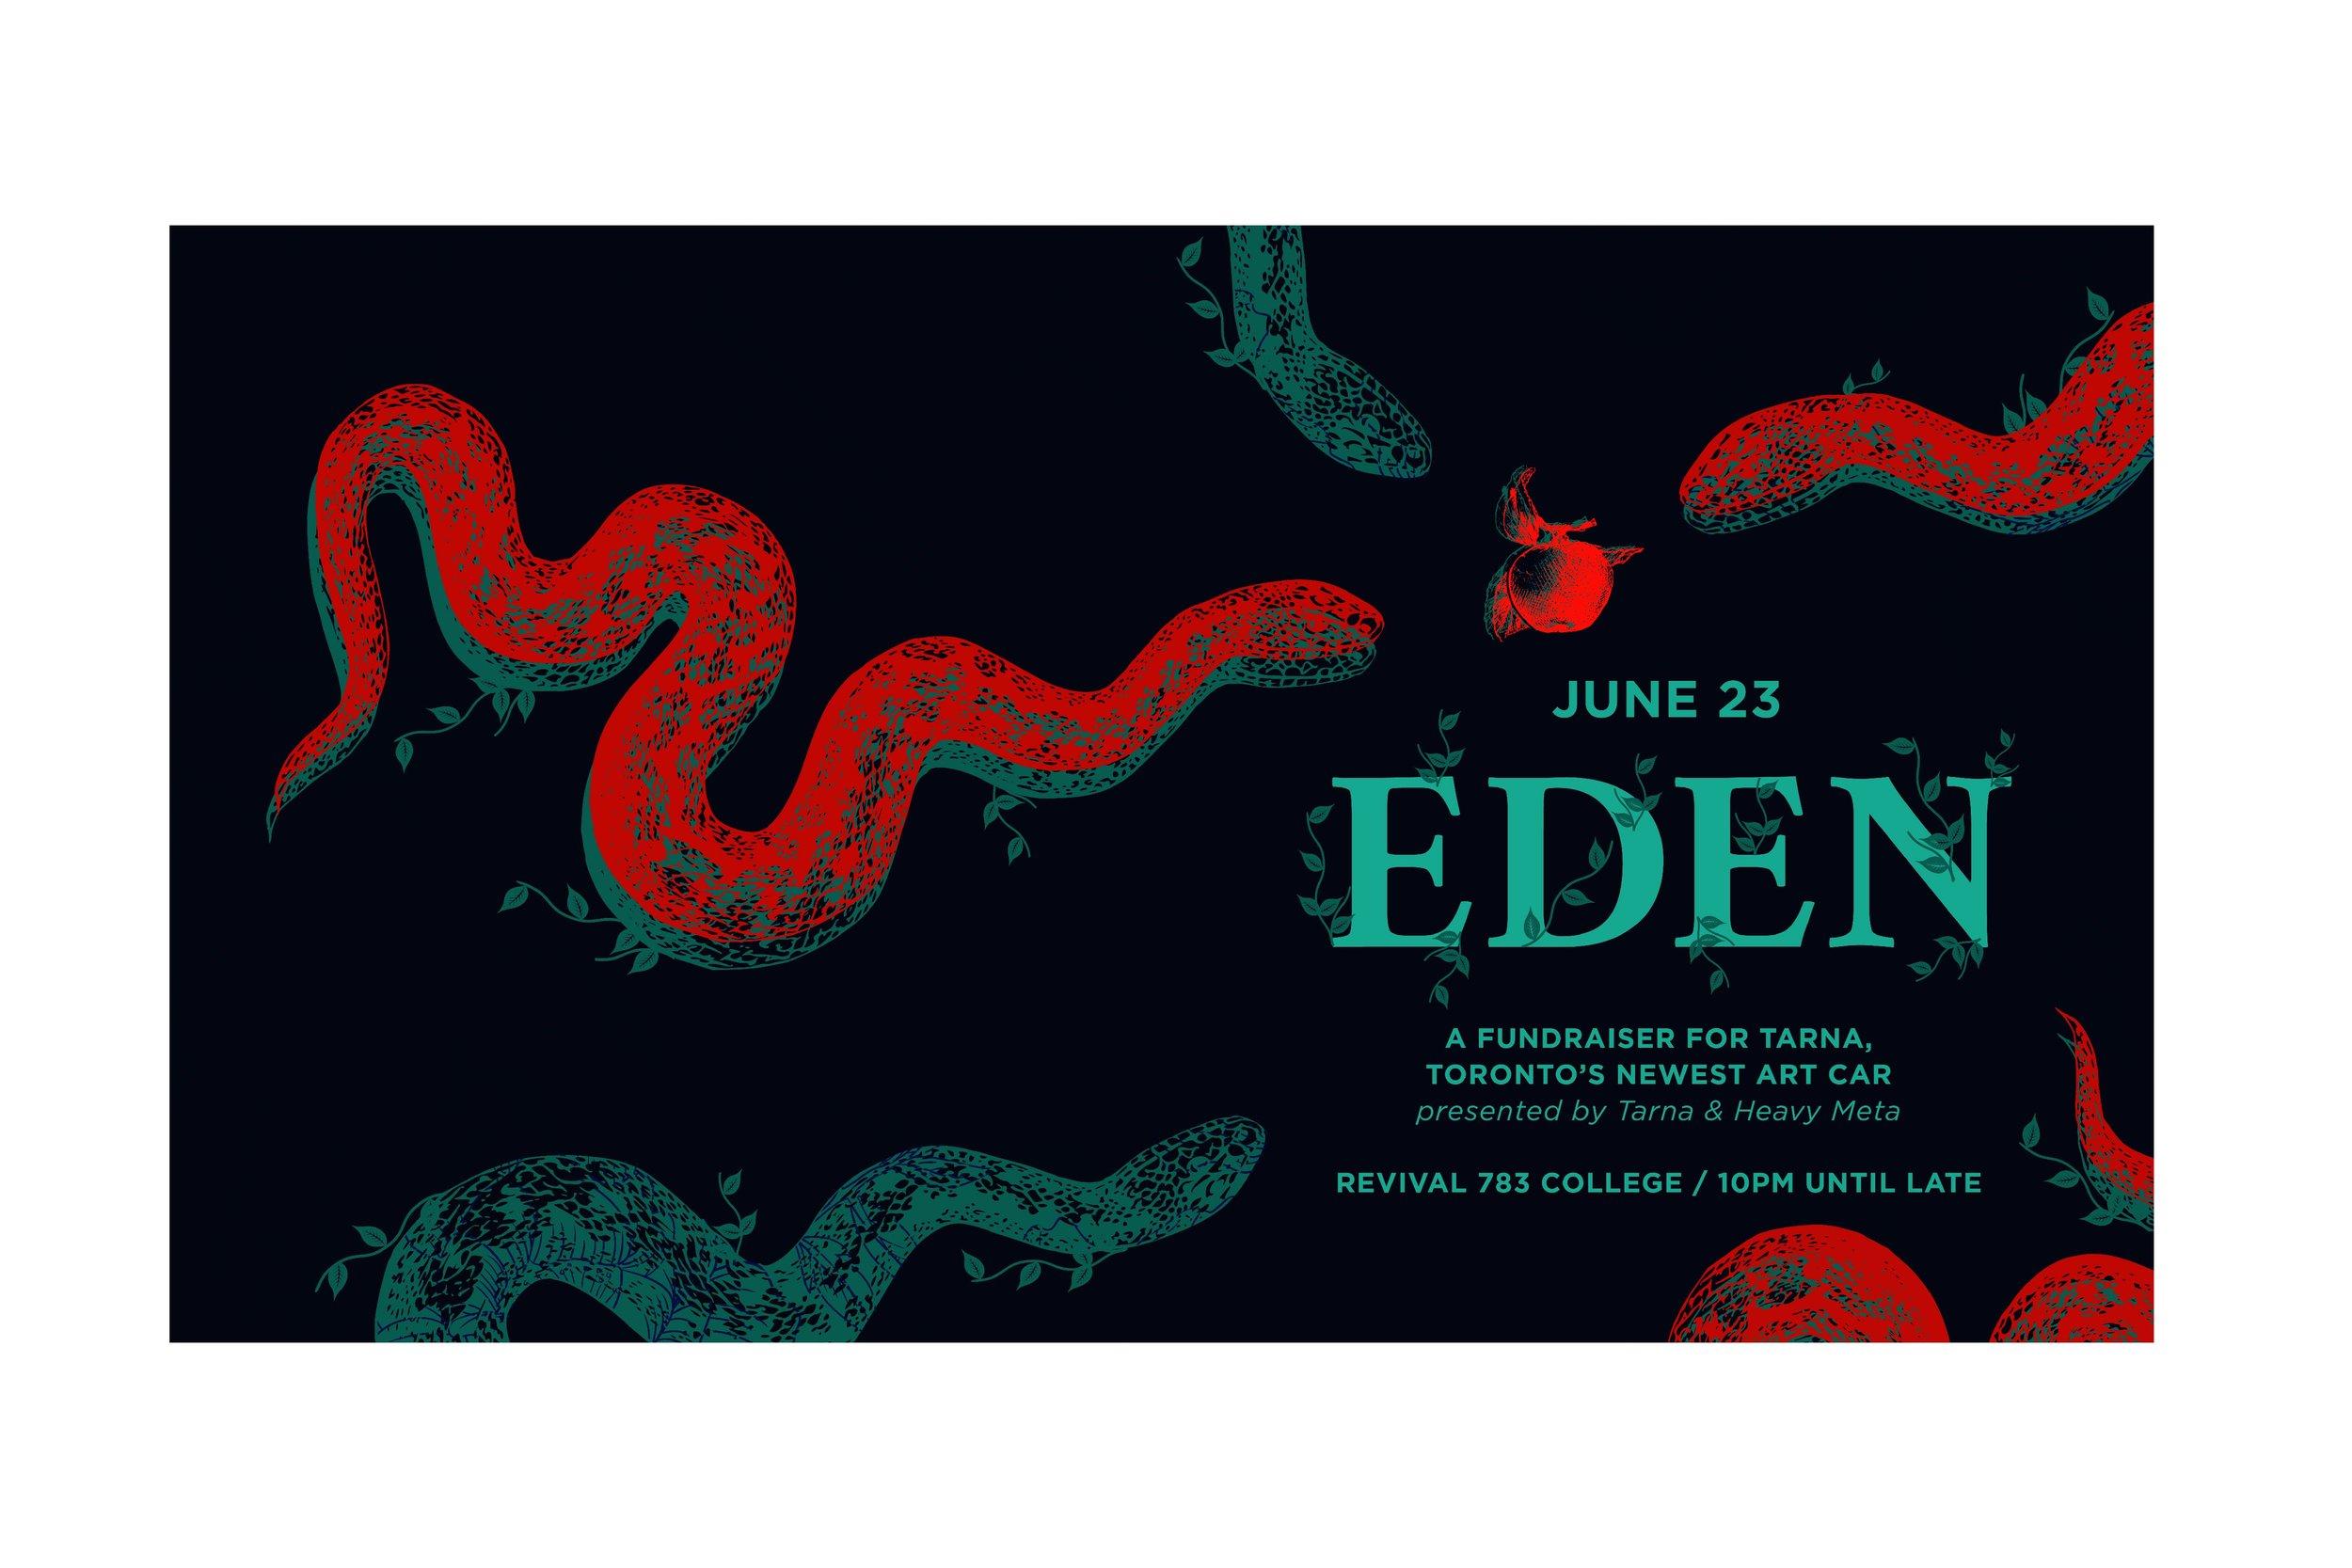 eden_Concepts_logo_banner.jpg